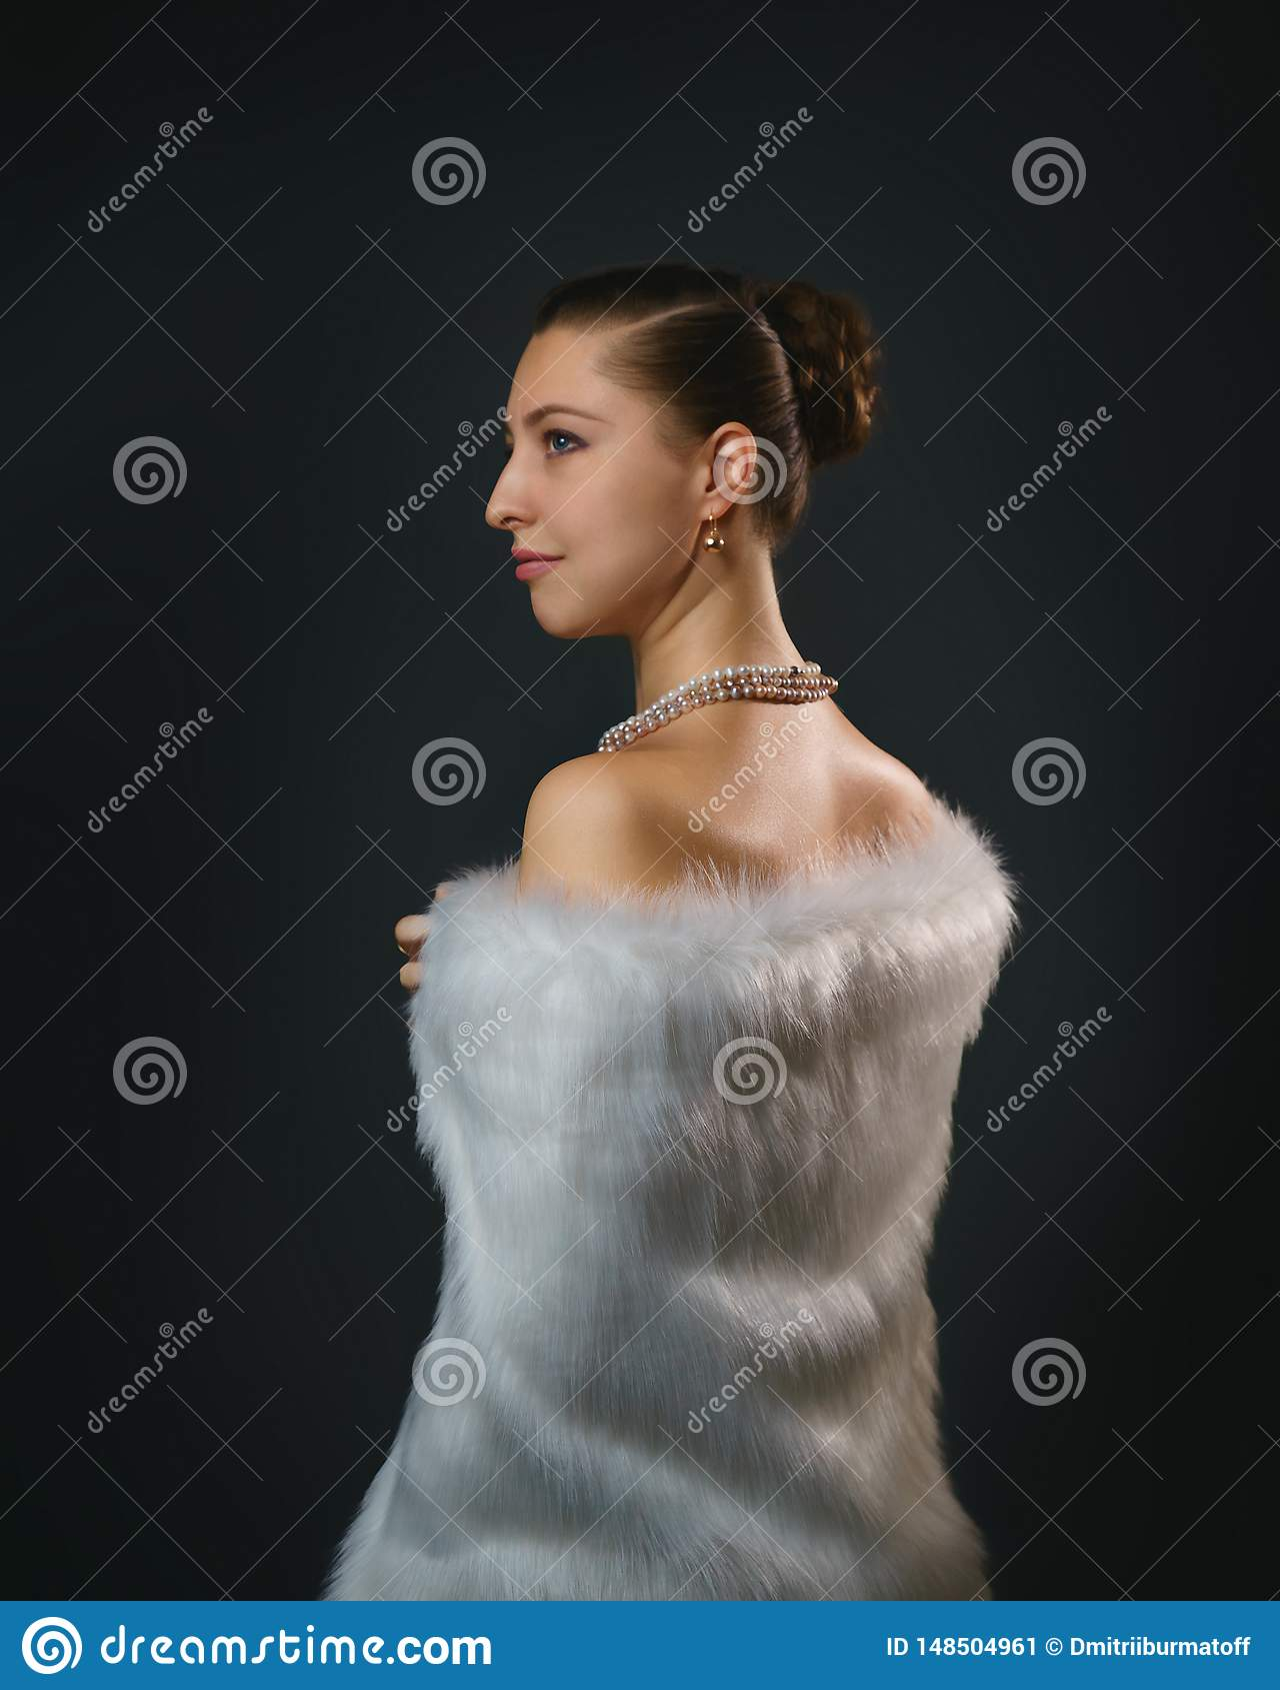 Rich lifestyle. Beautiful sexual woman wearing jewelery and white fur vest. Beauty, fashion